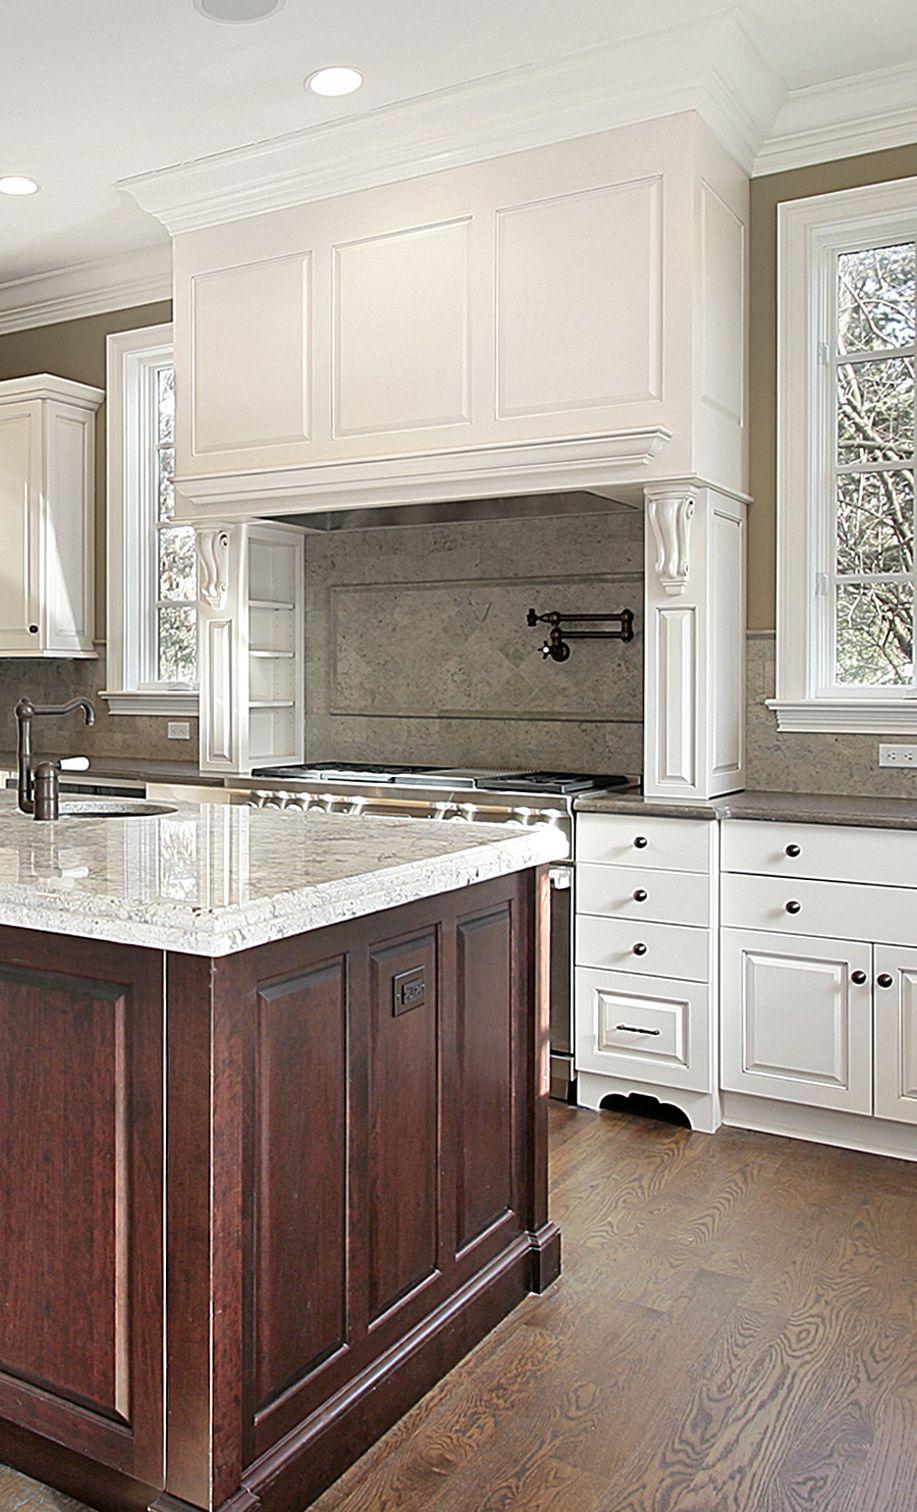 Cream kitchen with large decorative range hood and cherry